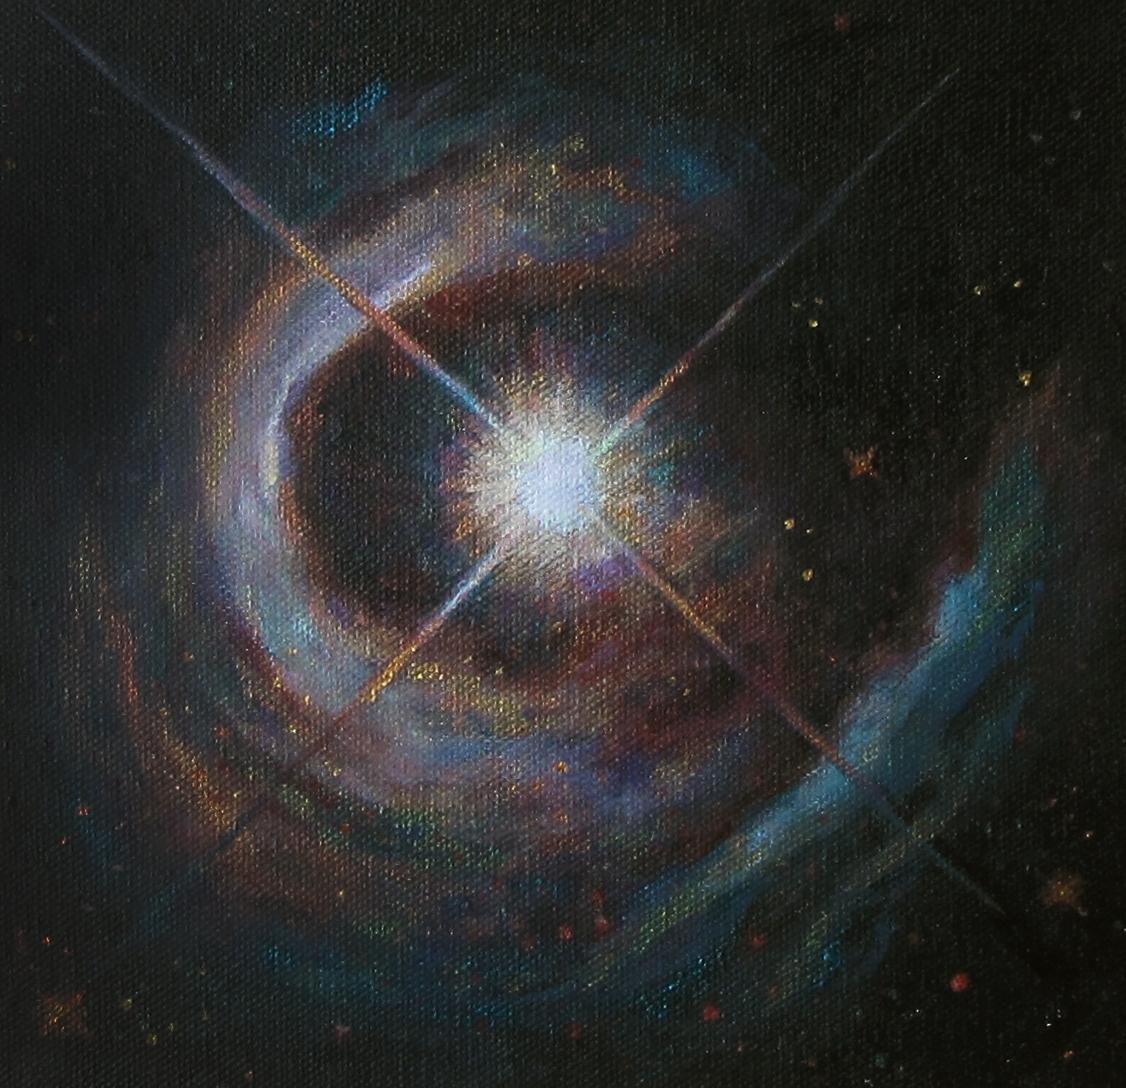 """1: T Tauri, Young  Stellar Object"""